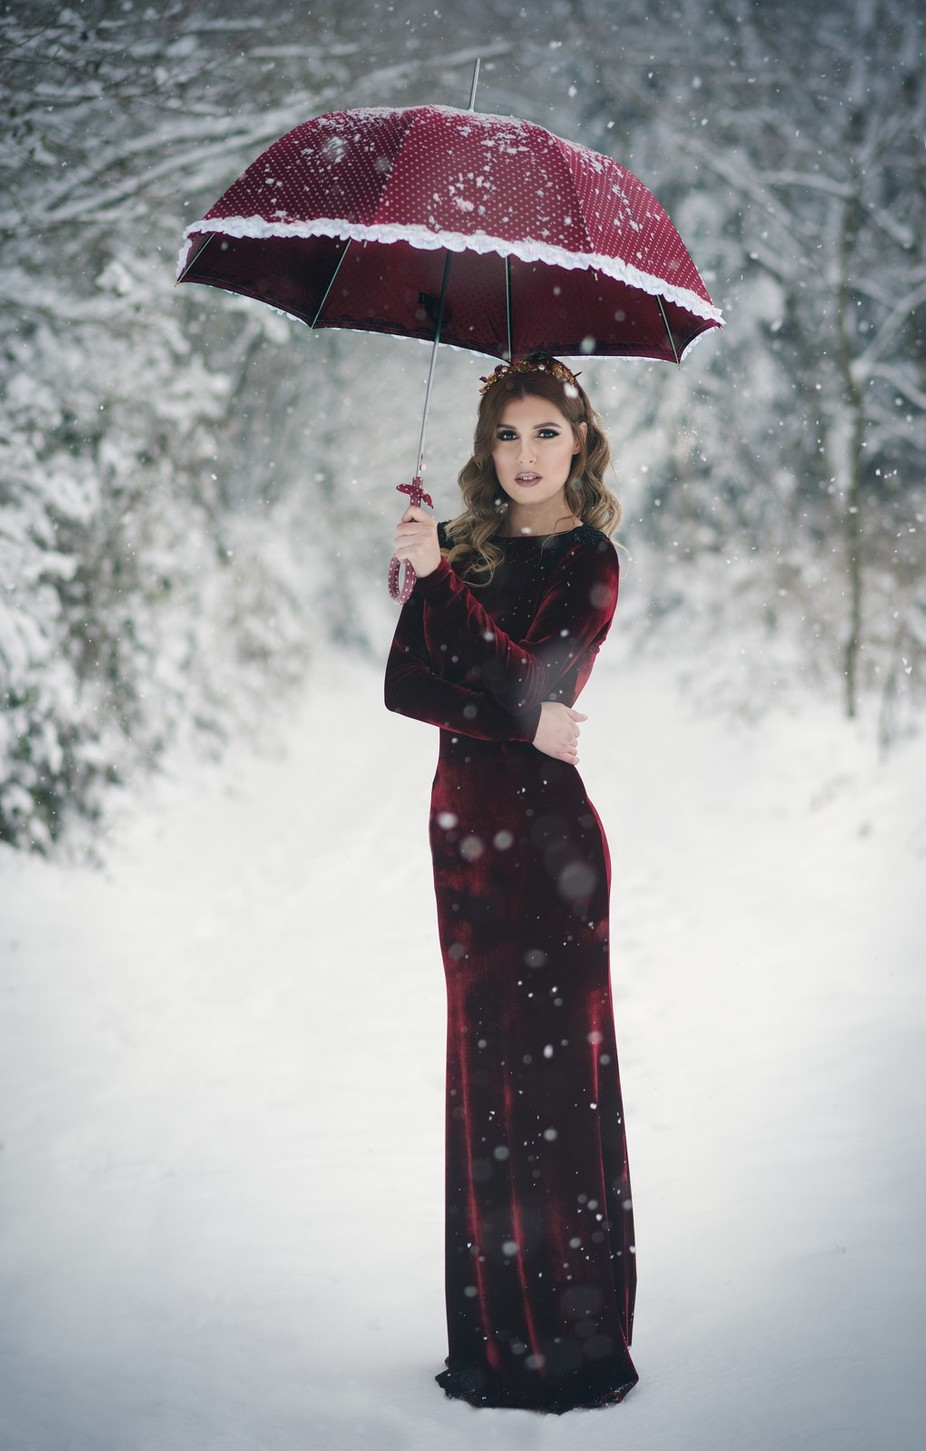 snow queen by sanjahitrec-leljak - Celebrating Fashion Photo Contest